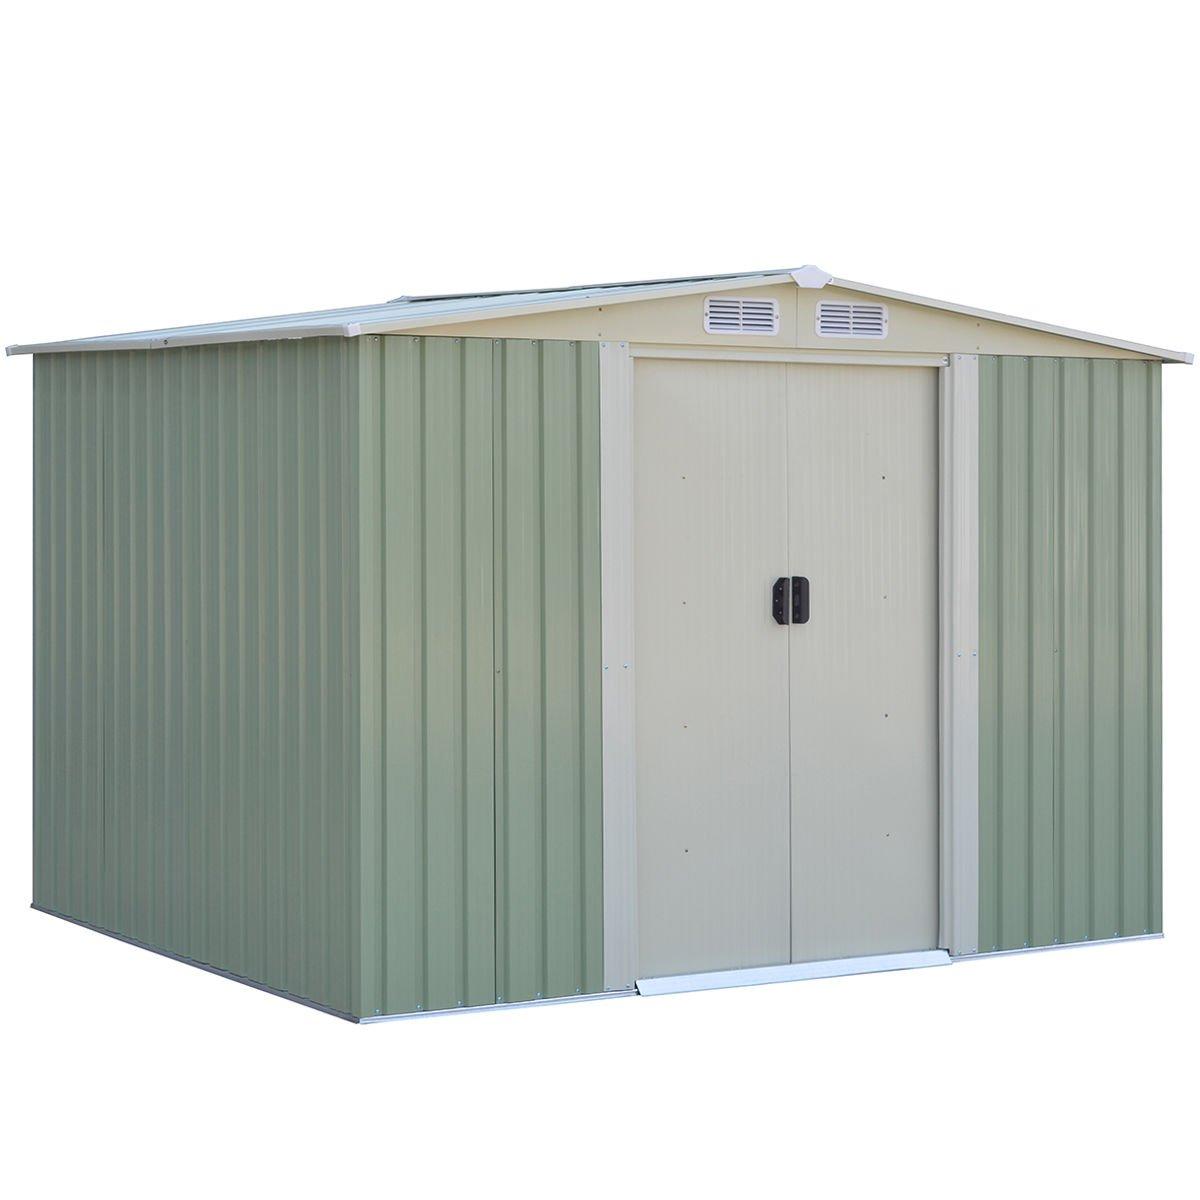 Goplus Galvanized Steel Outdoor Garden Storage Shed 6 x 8 Ft Heavy Duty Tool House W/ Sliding Door (Green) by Goplus